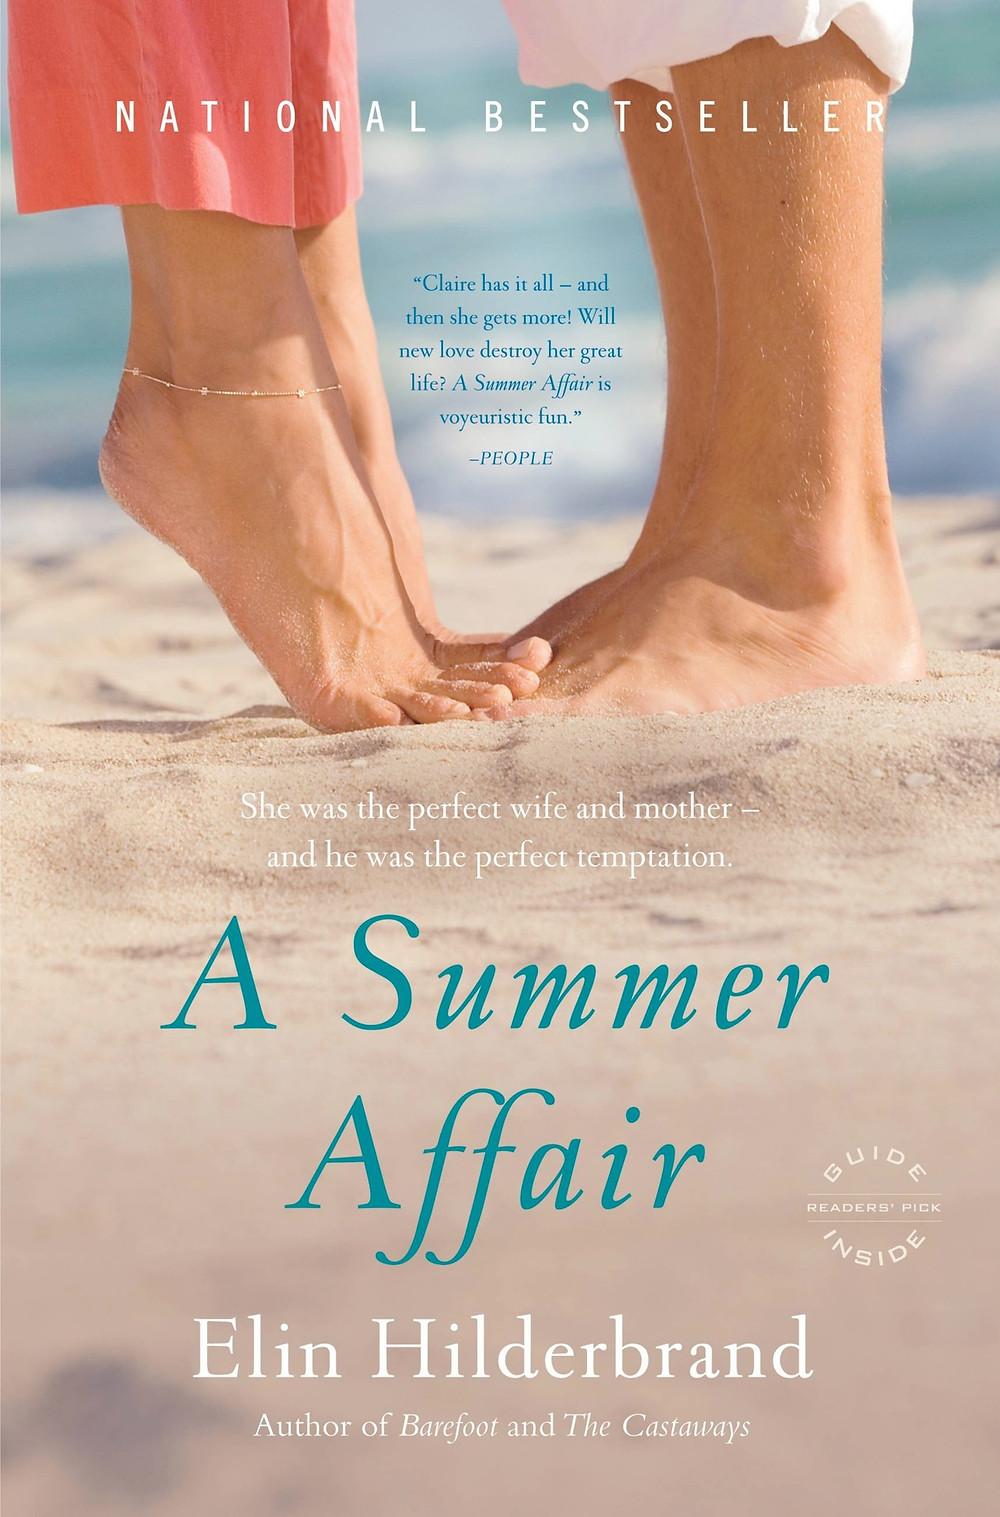 A Summer Affair by Elin Hilderbrand : the book slut book reviews